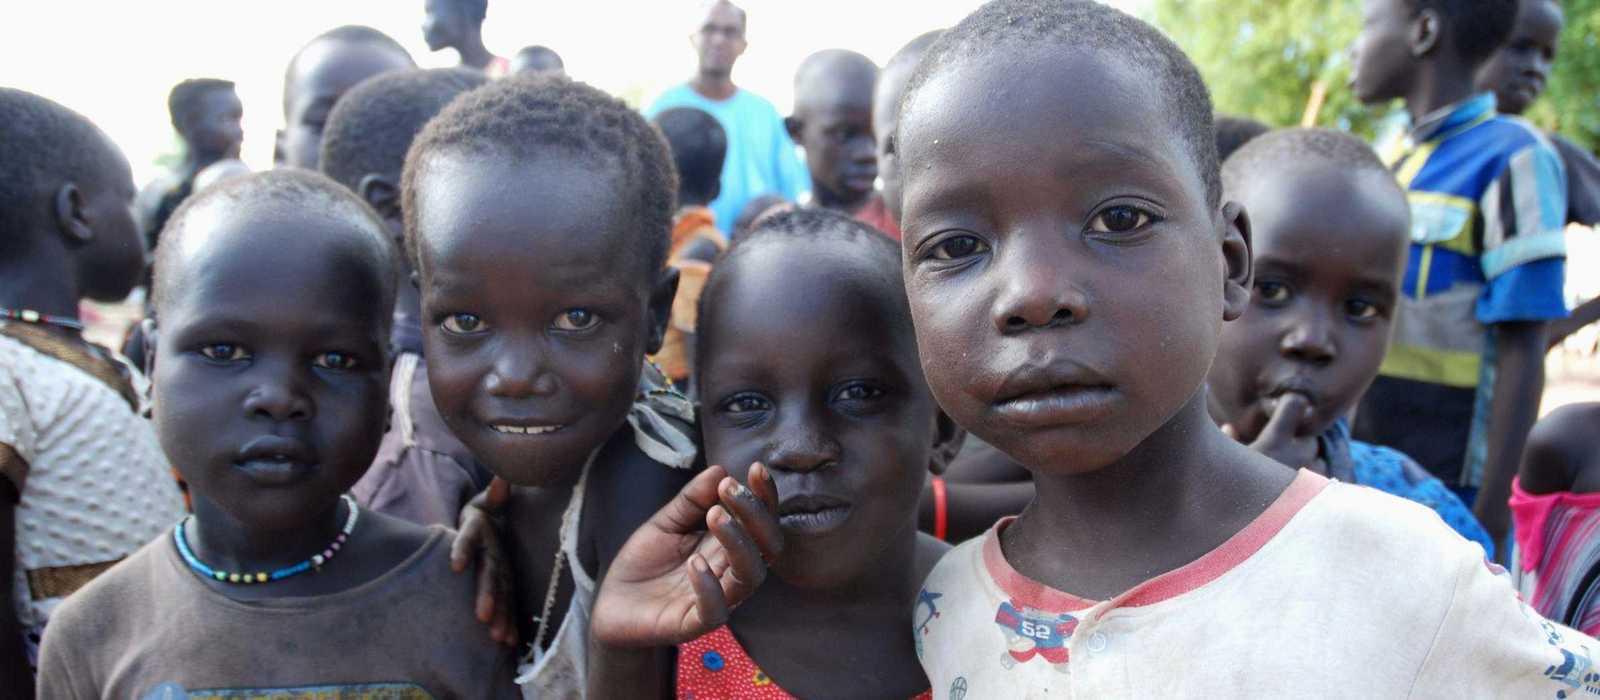 Gruppe kleiner Kinder im Camp Gumbo